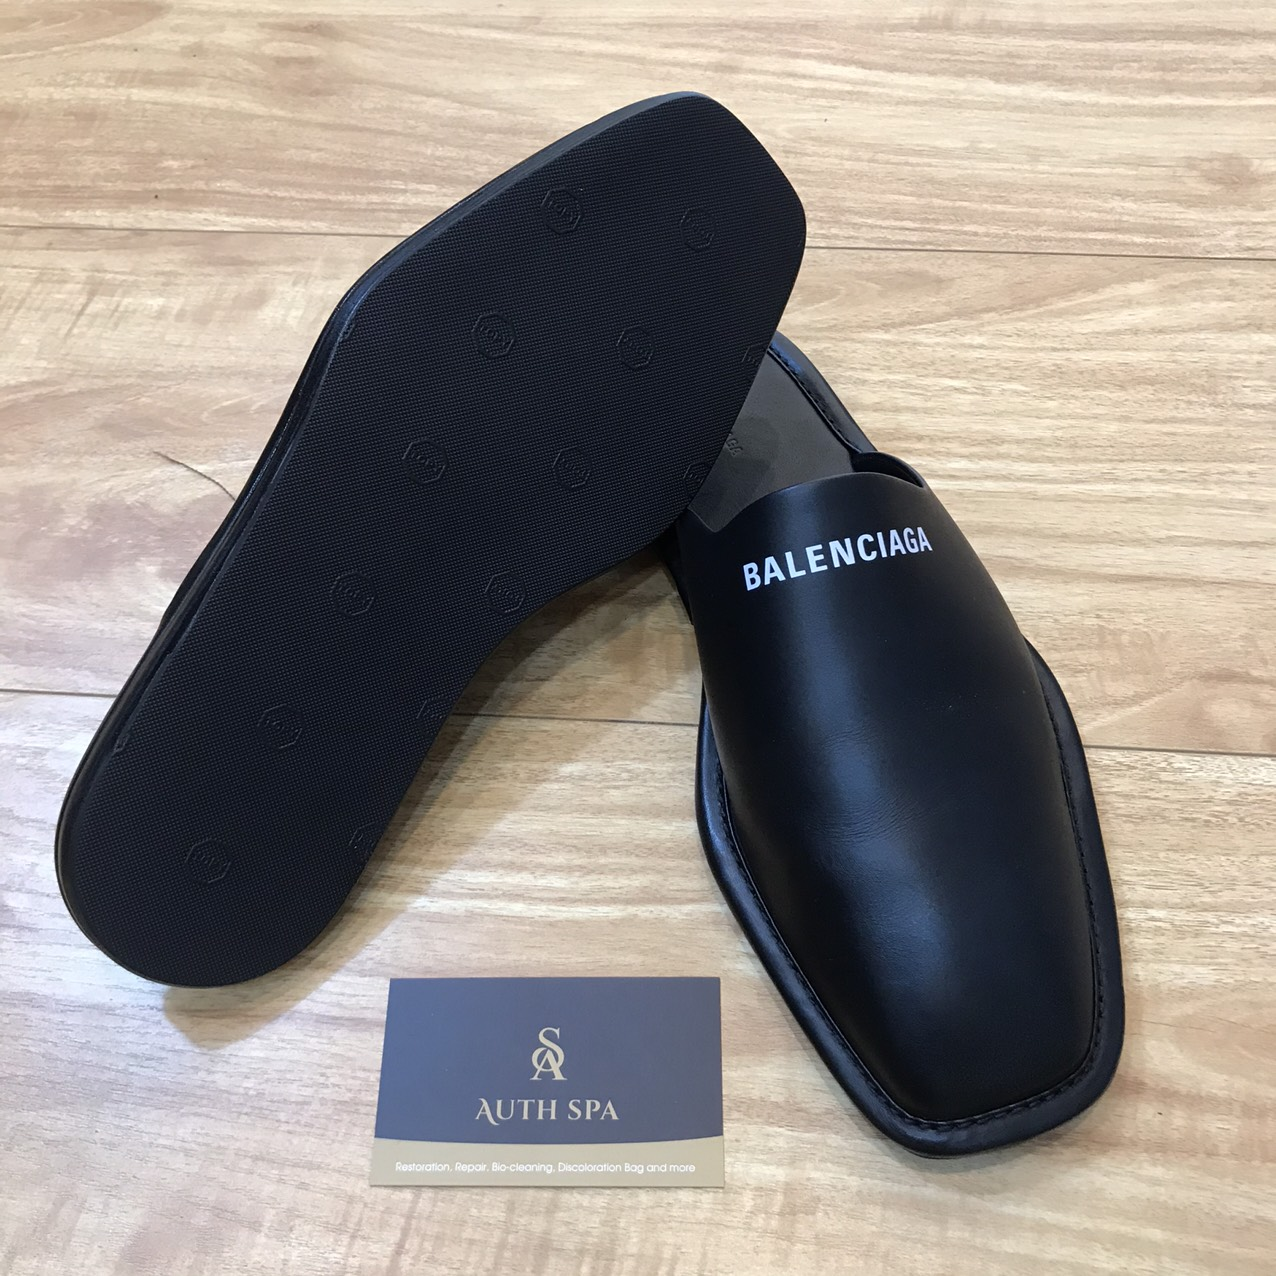 Sửa Chữa Giày Dép Gucci, Chanel, Louis Vuitton, Hermes ... 20